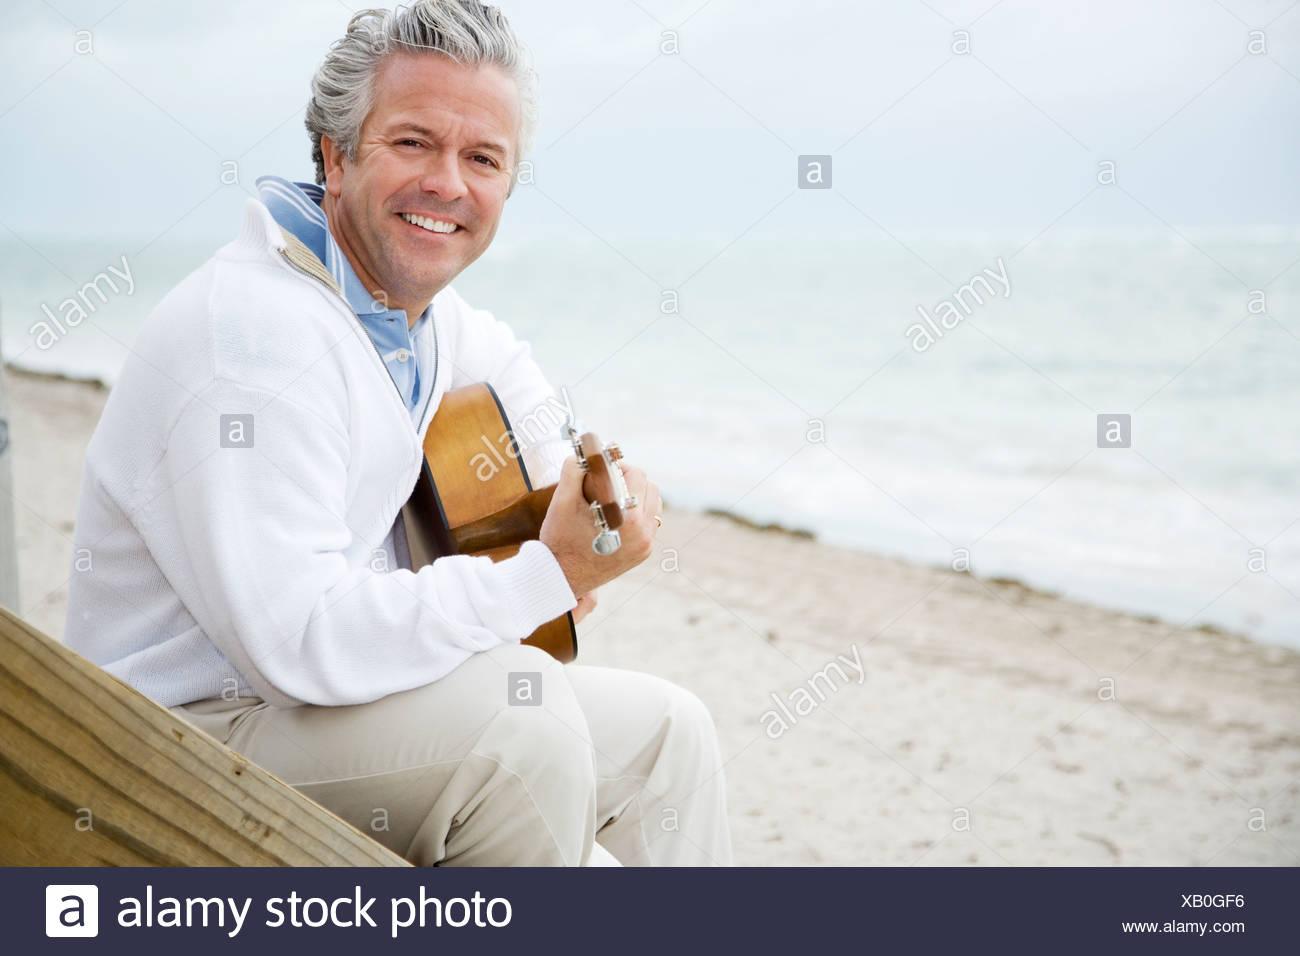 A senior man playing a guitar - Stock Image